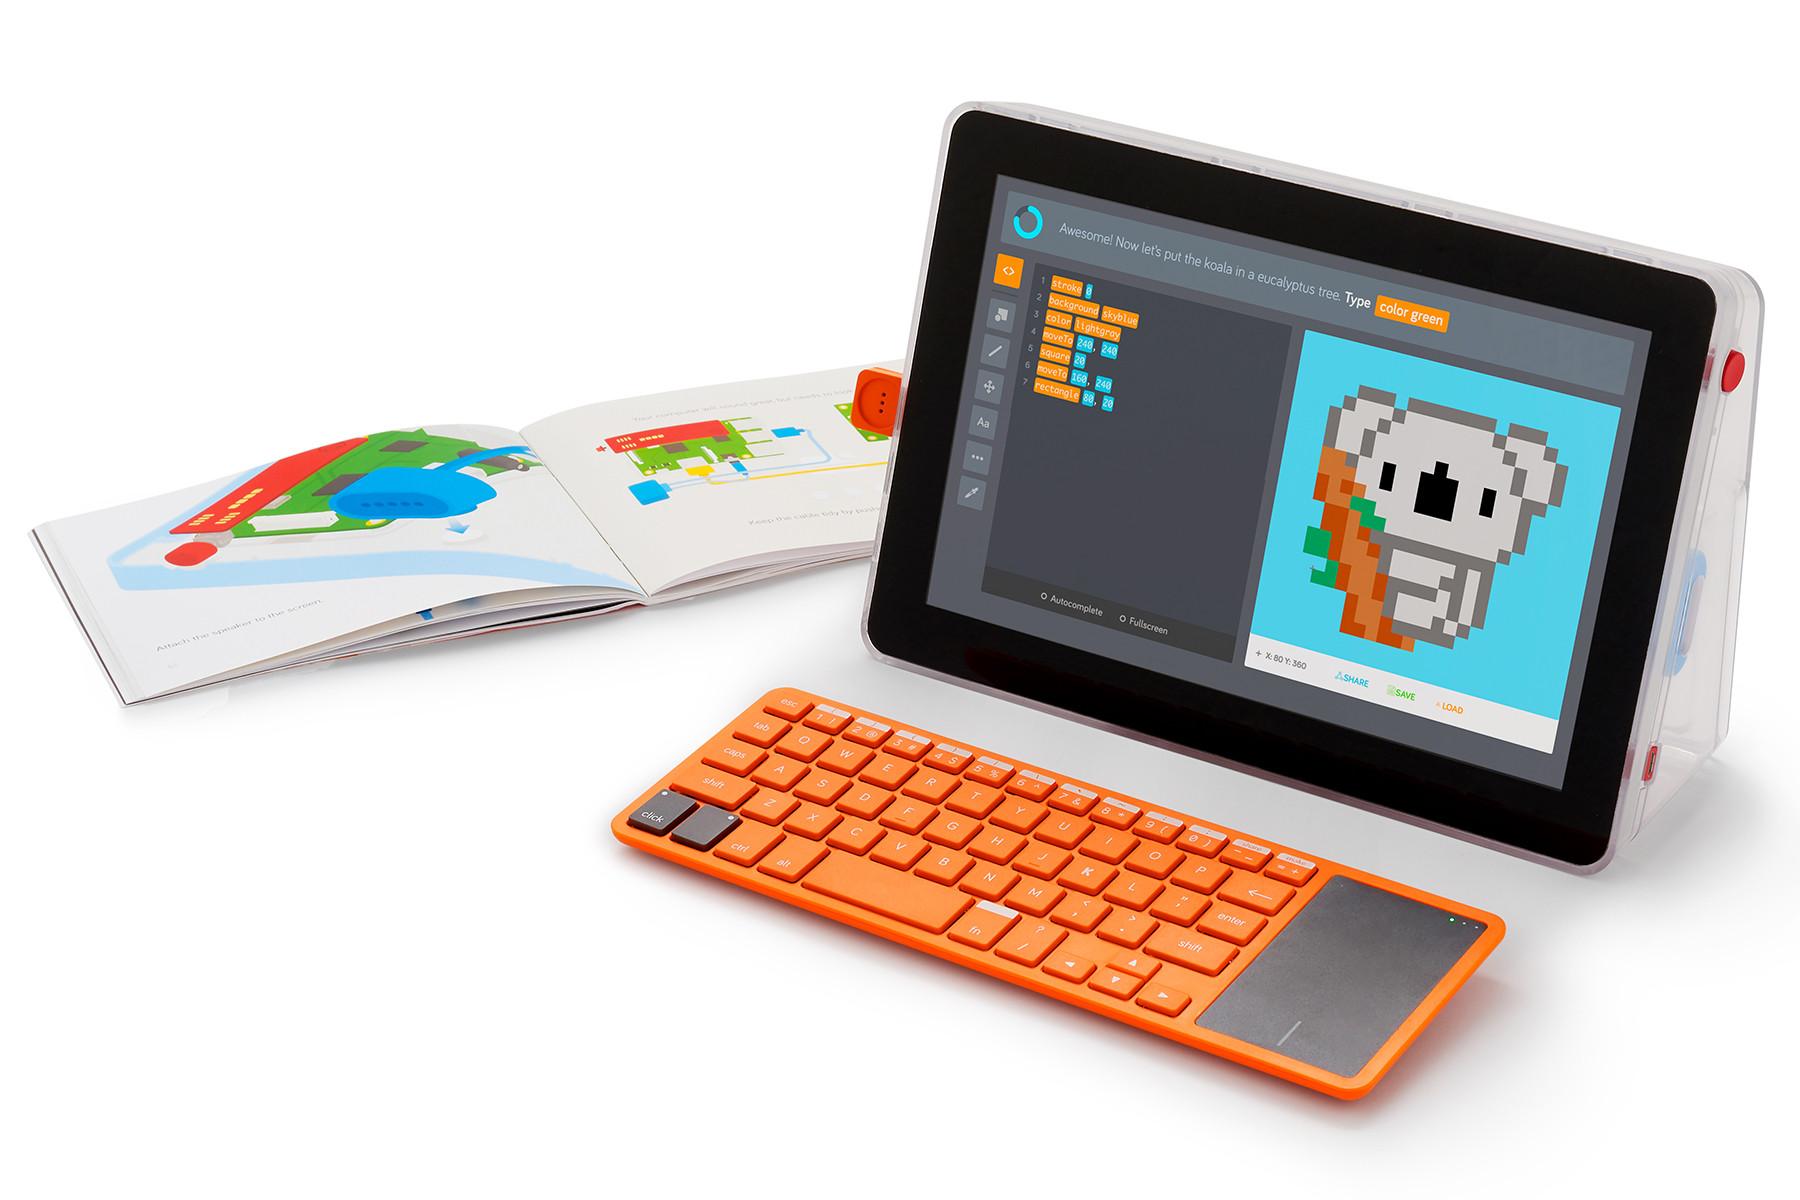 Diy Laptop  Kano bines its coding kits for a DIY laptop